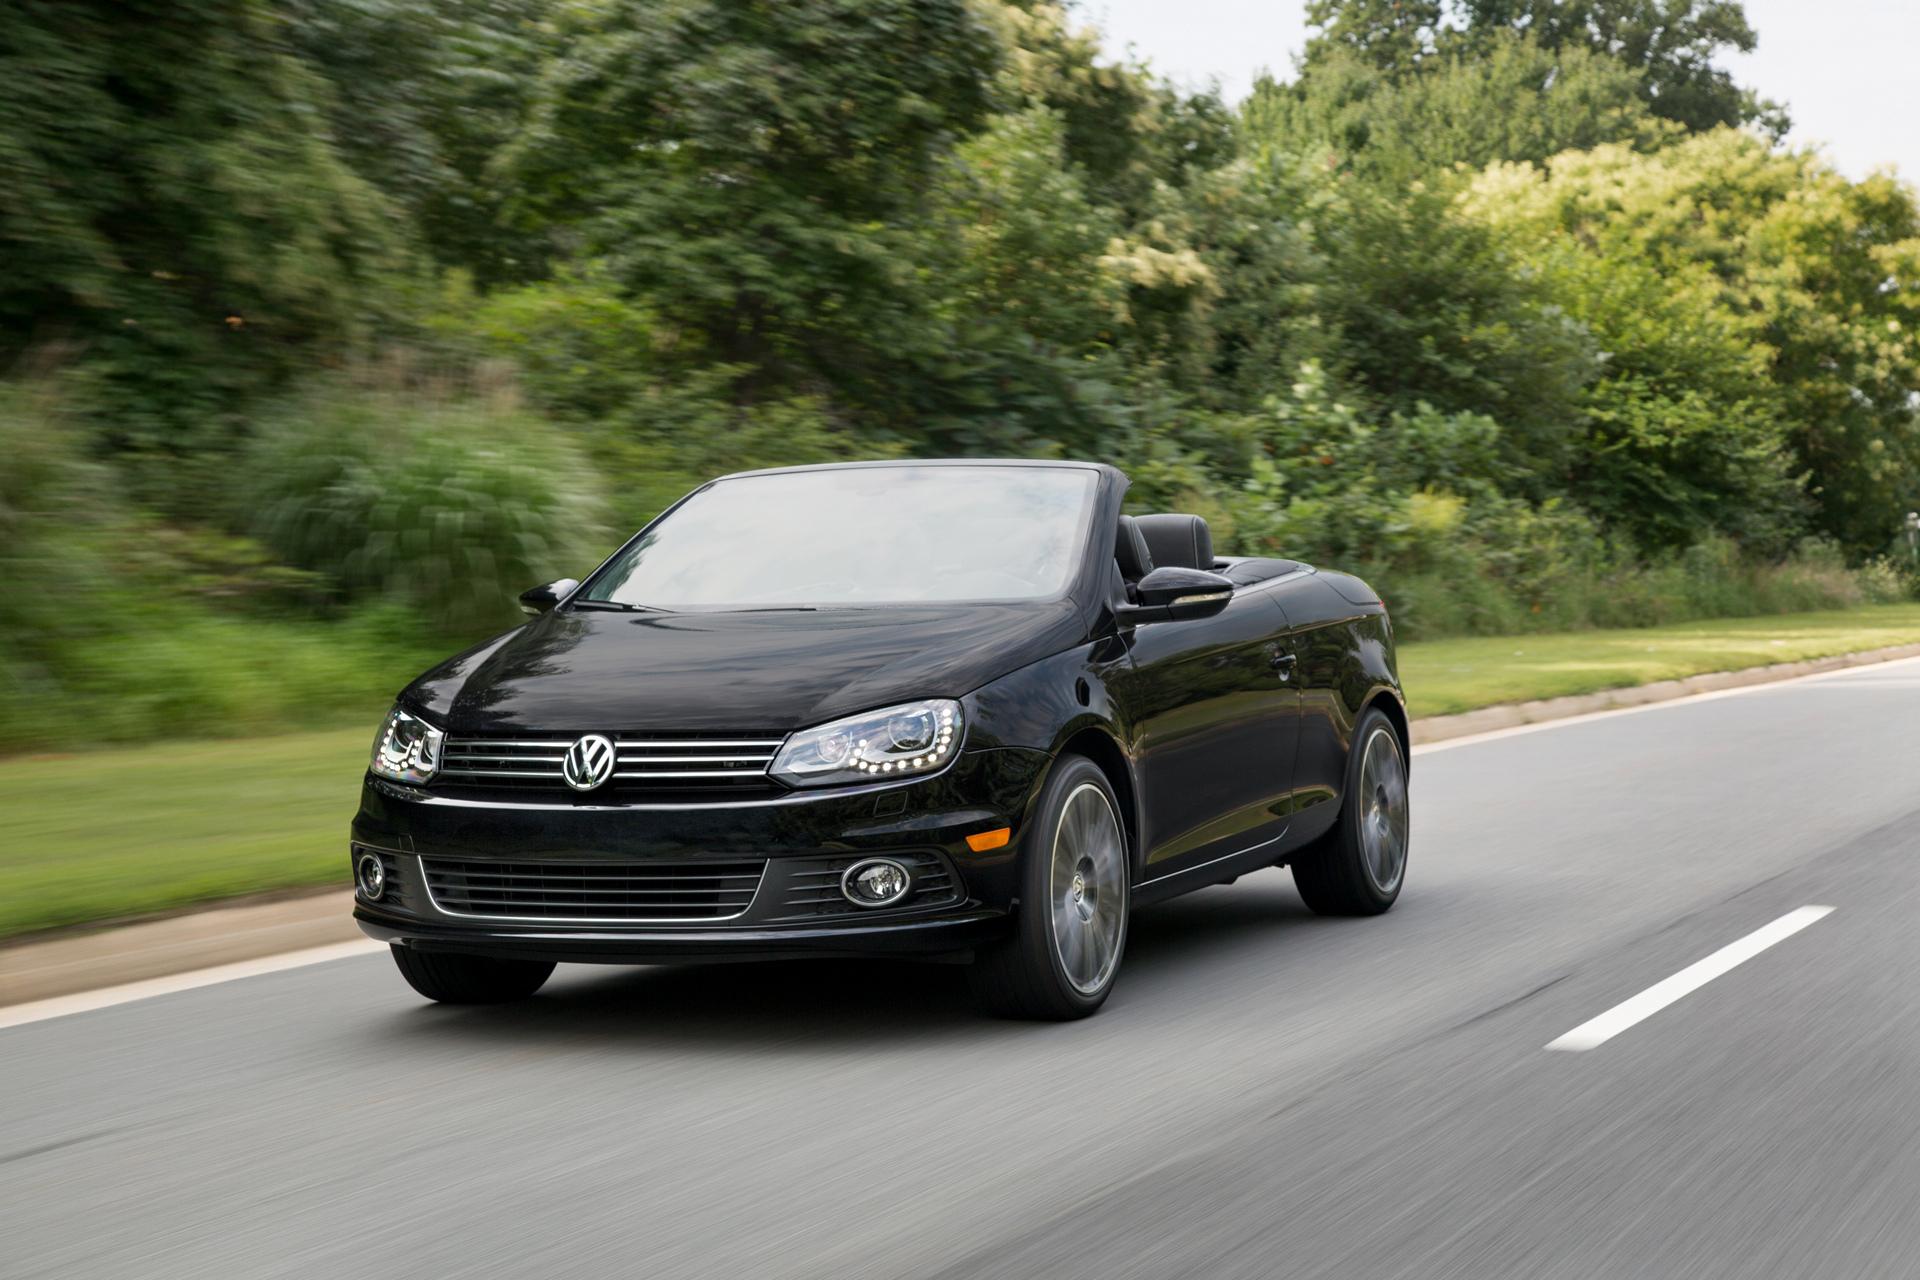 2016 Volkswagen Eos Review - Carrrs Auto Portal